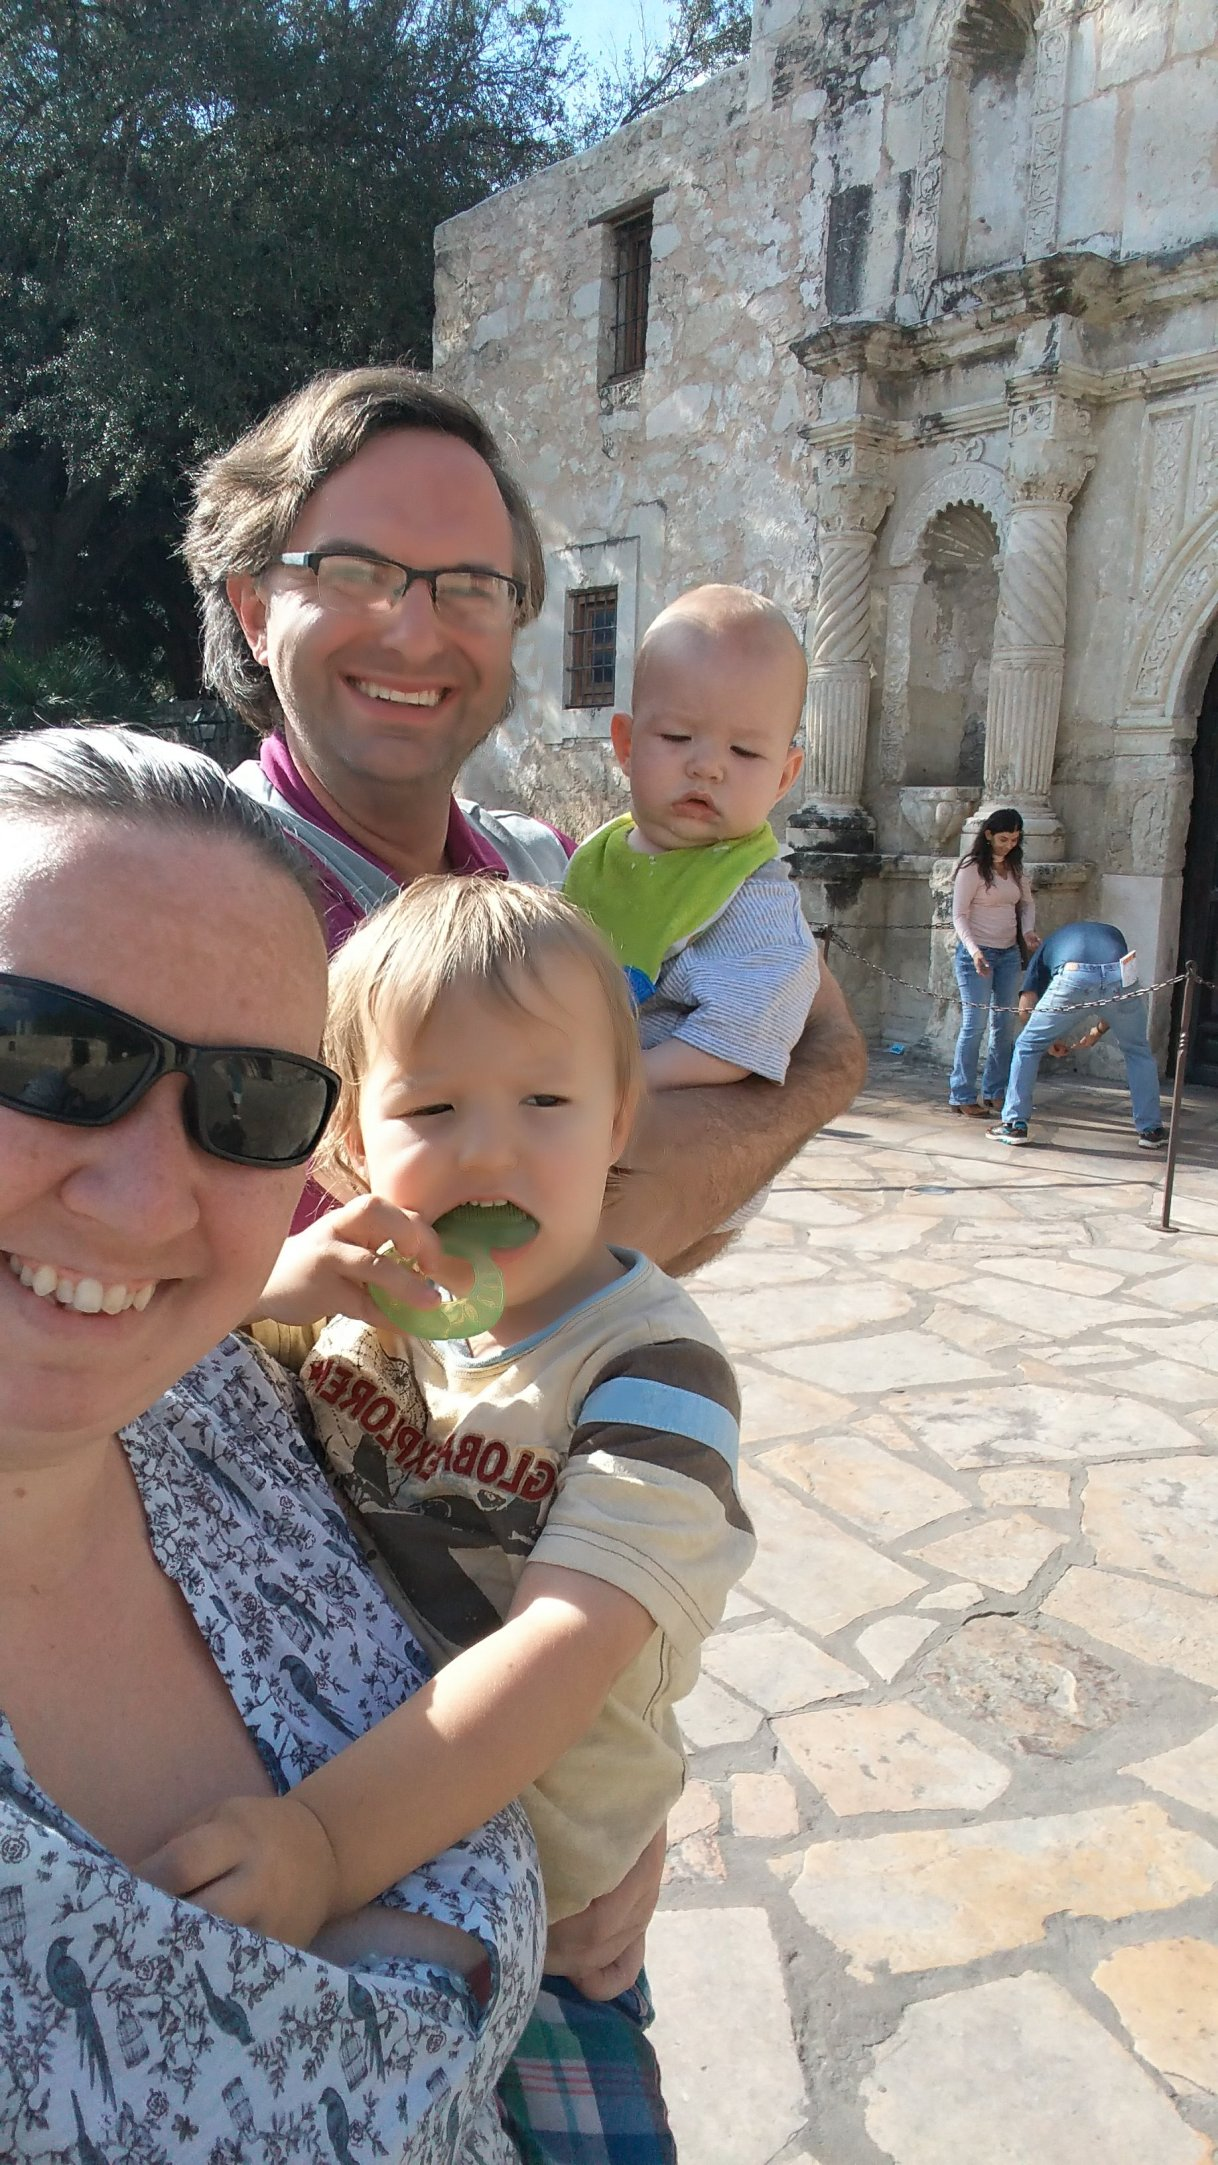 San Antonio – Visiting theAlamo